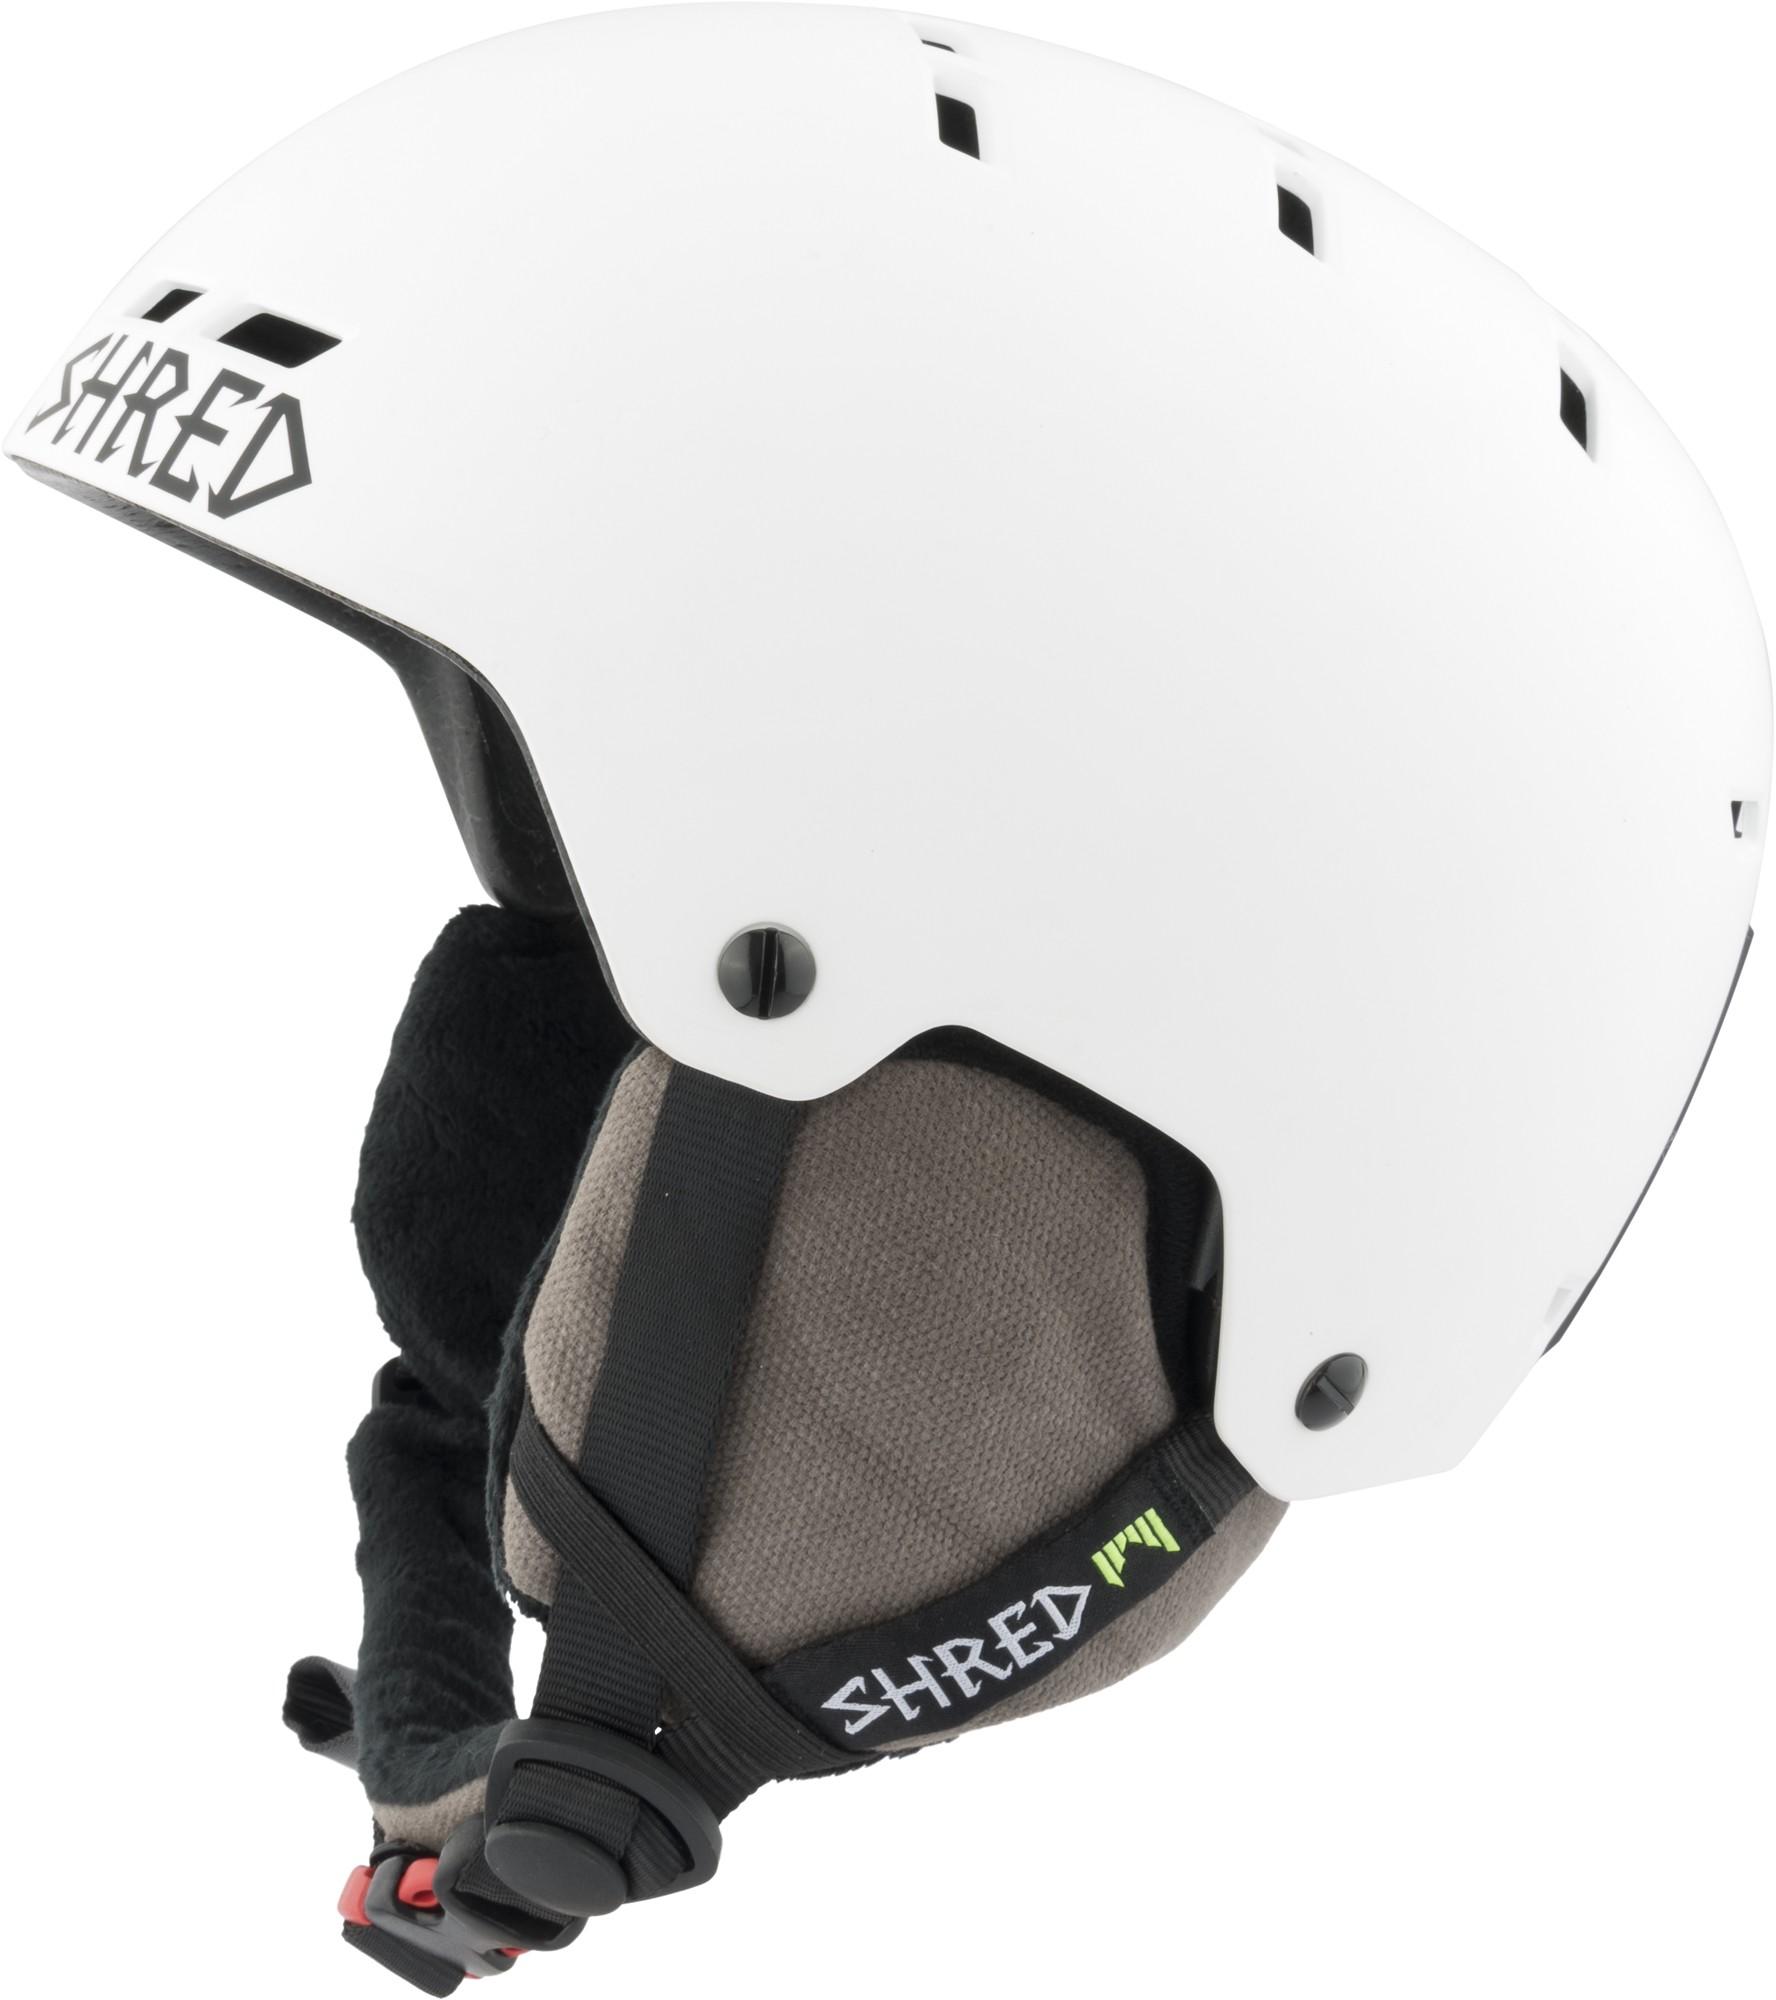 Shred BUMPER NoShock warm BLEACH ski helmet, 2017